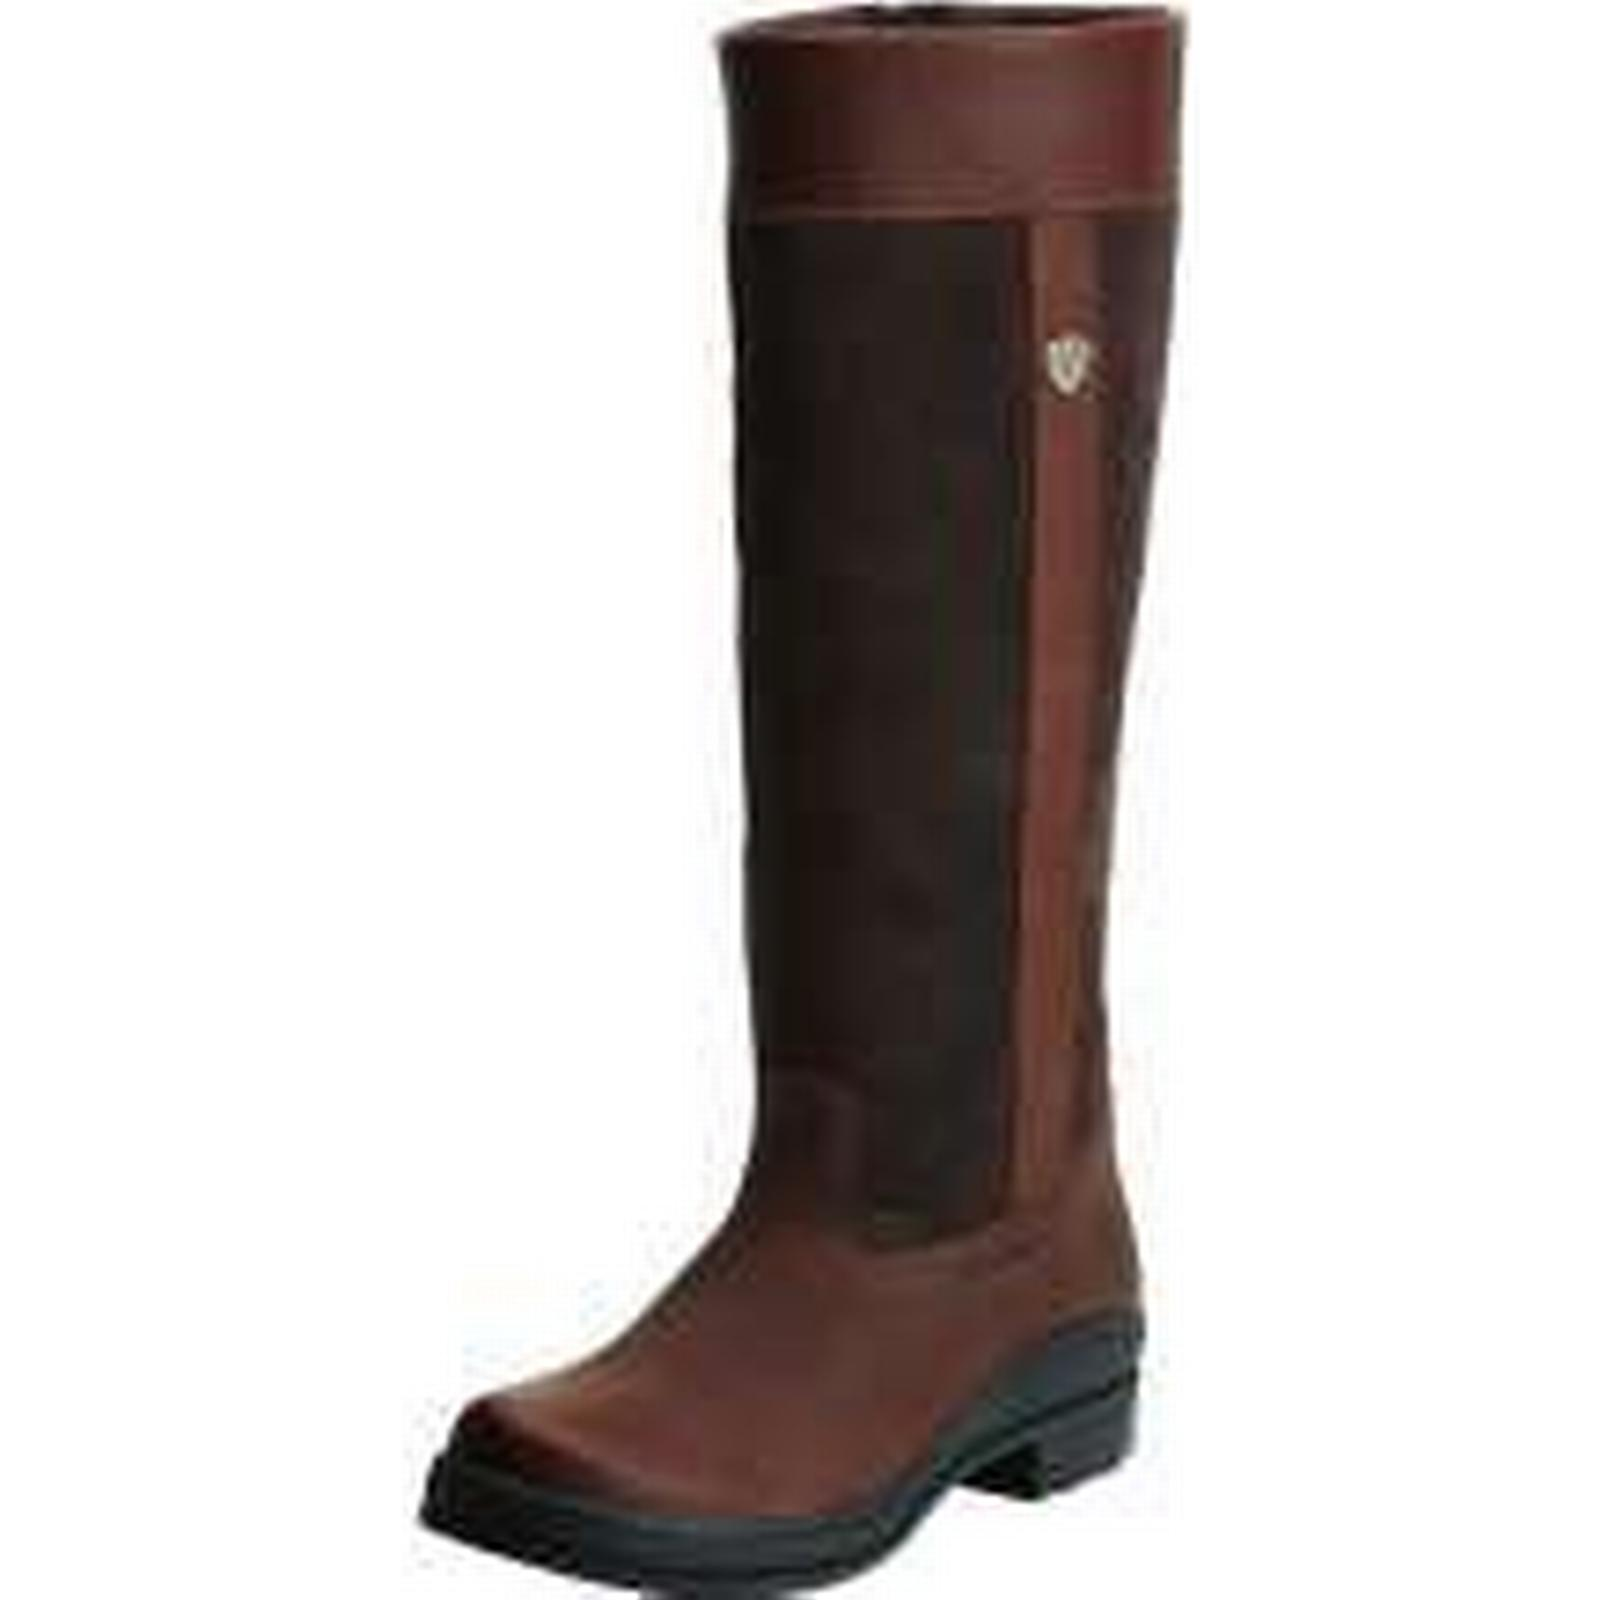 Ariat Windermere H2O 5 Boots, Dark Brown, UK 5 H2O Full Calf d63af2